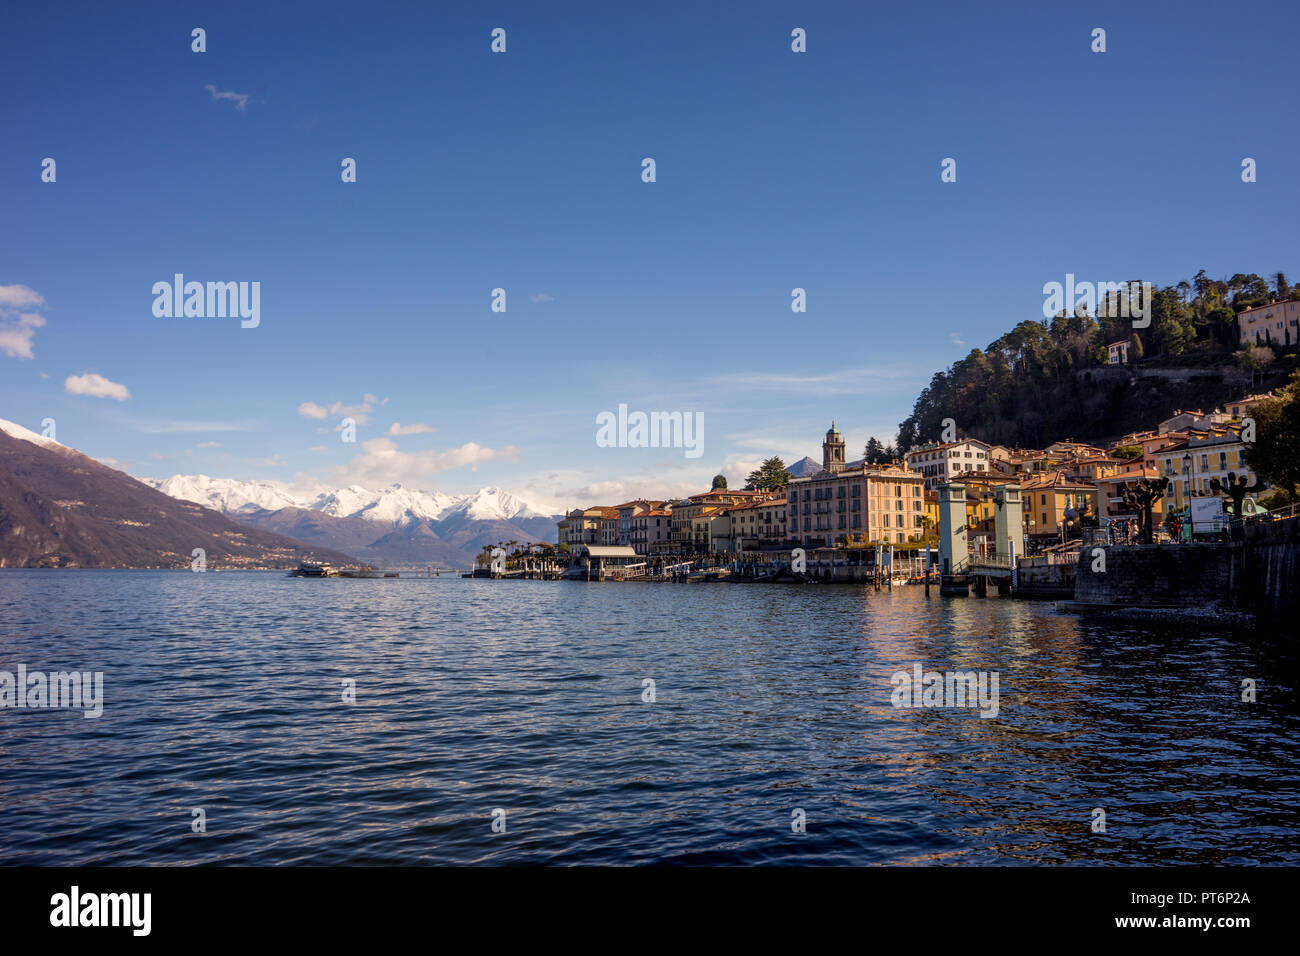 Europe, Italy, cityscape of Bellagio across lake Como - Stock Image